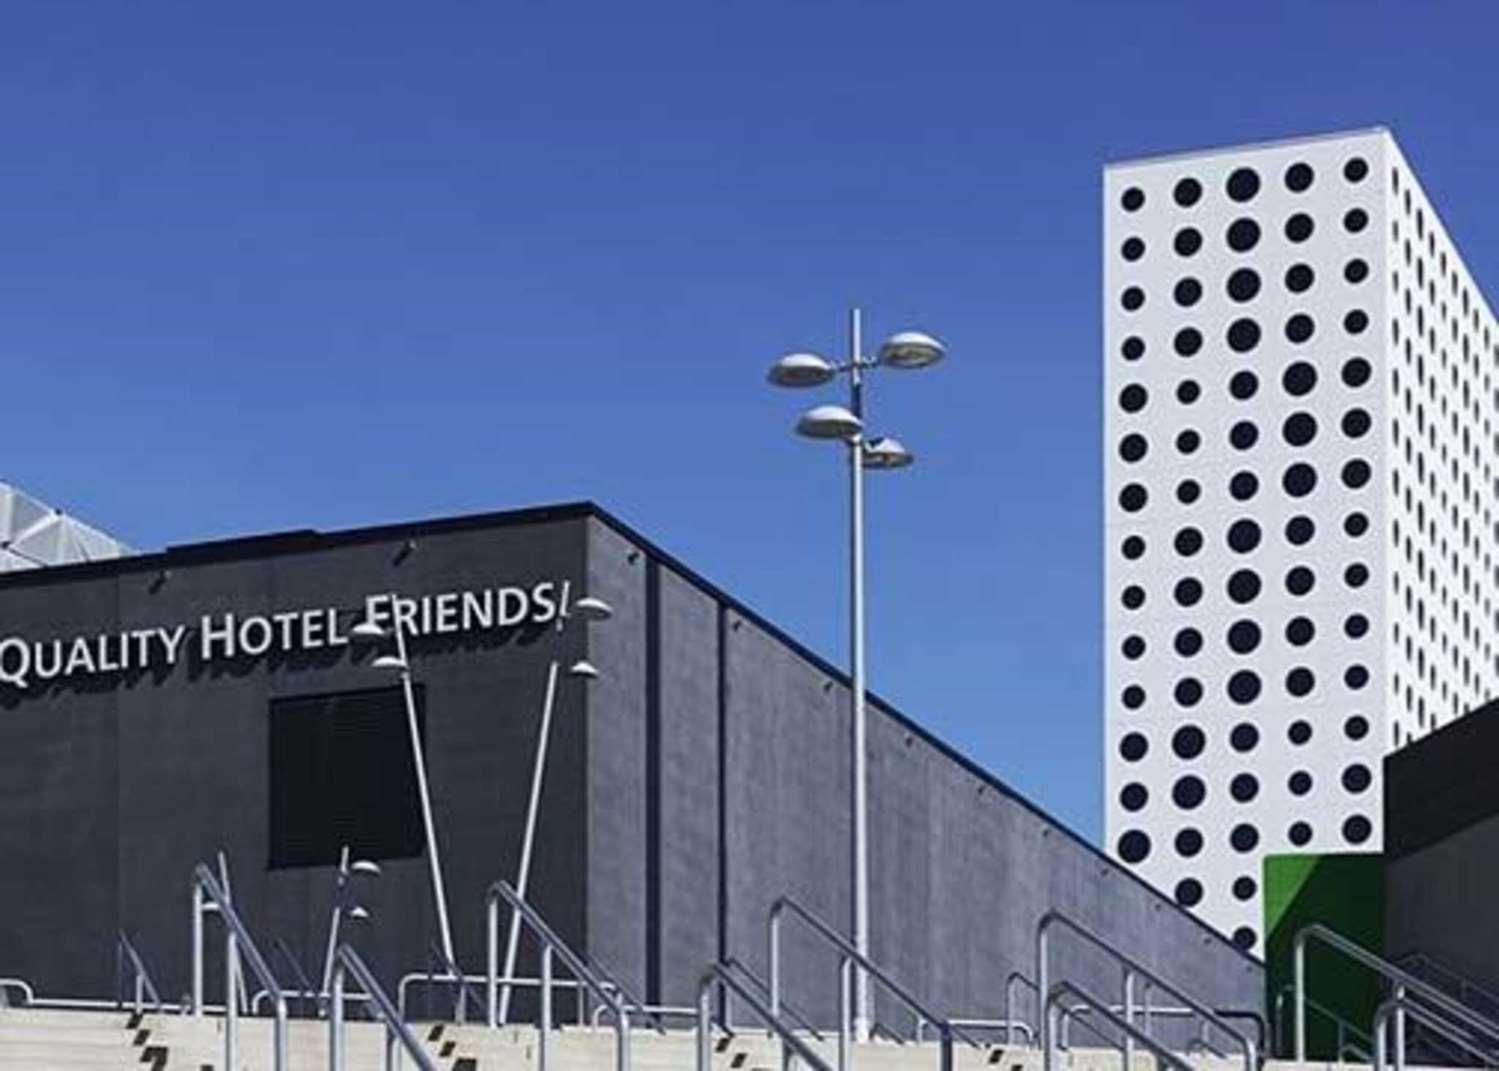 Quality Hotel Friends hotel in Stockholm, Sweden